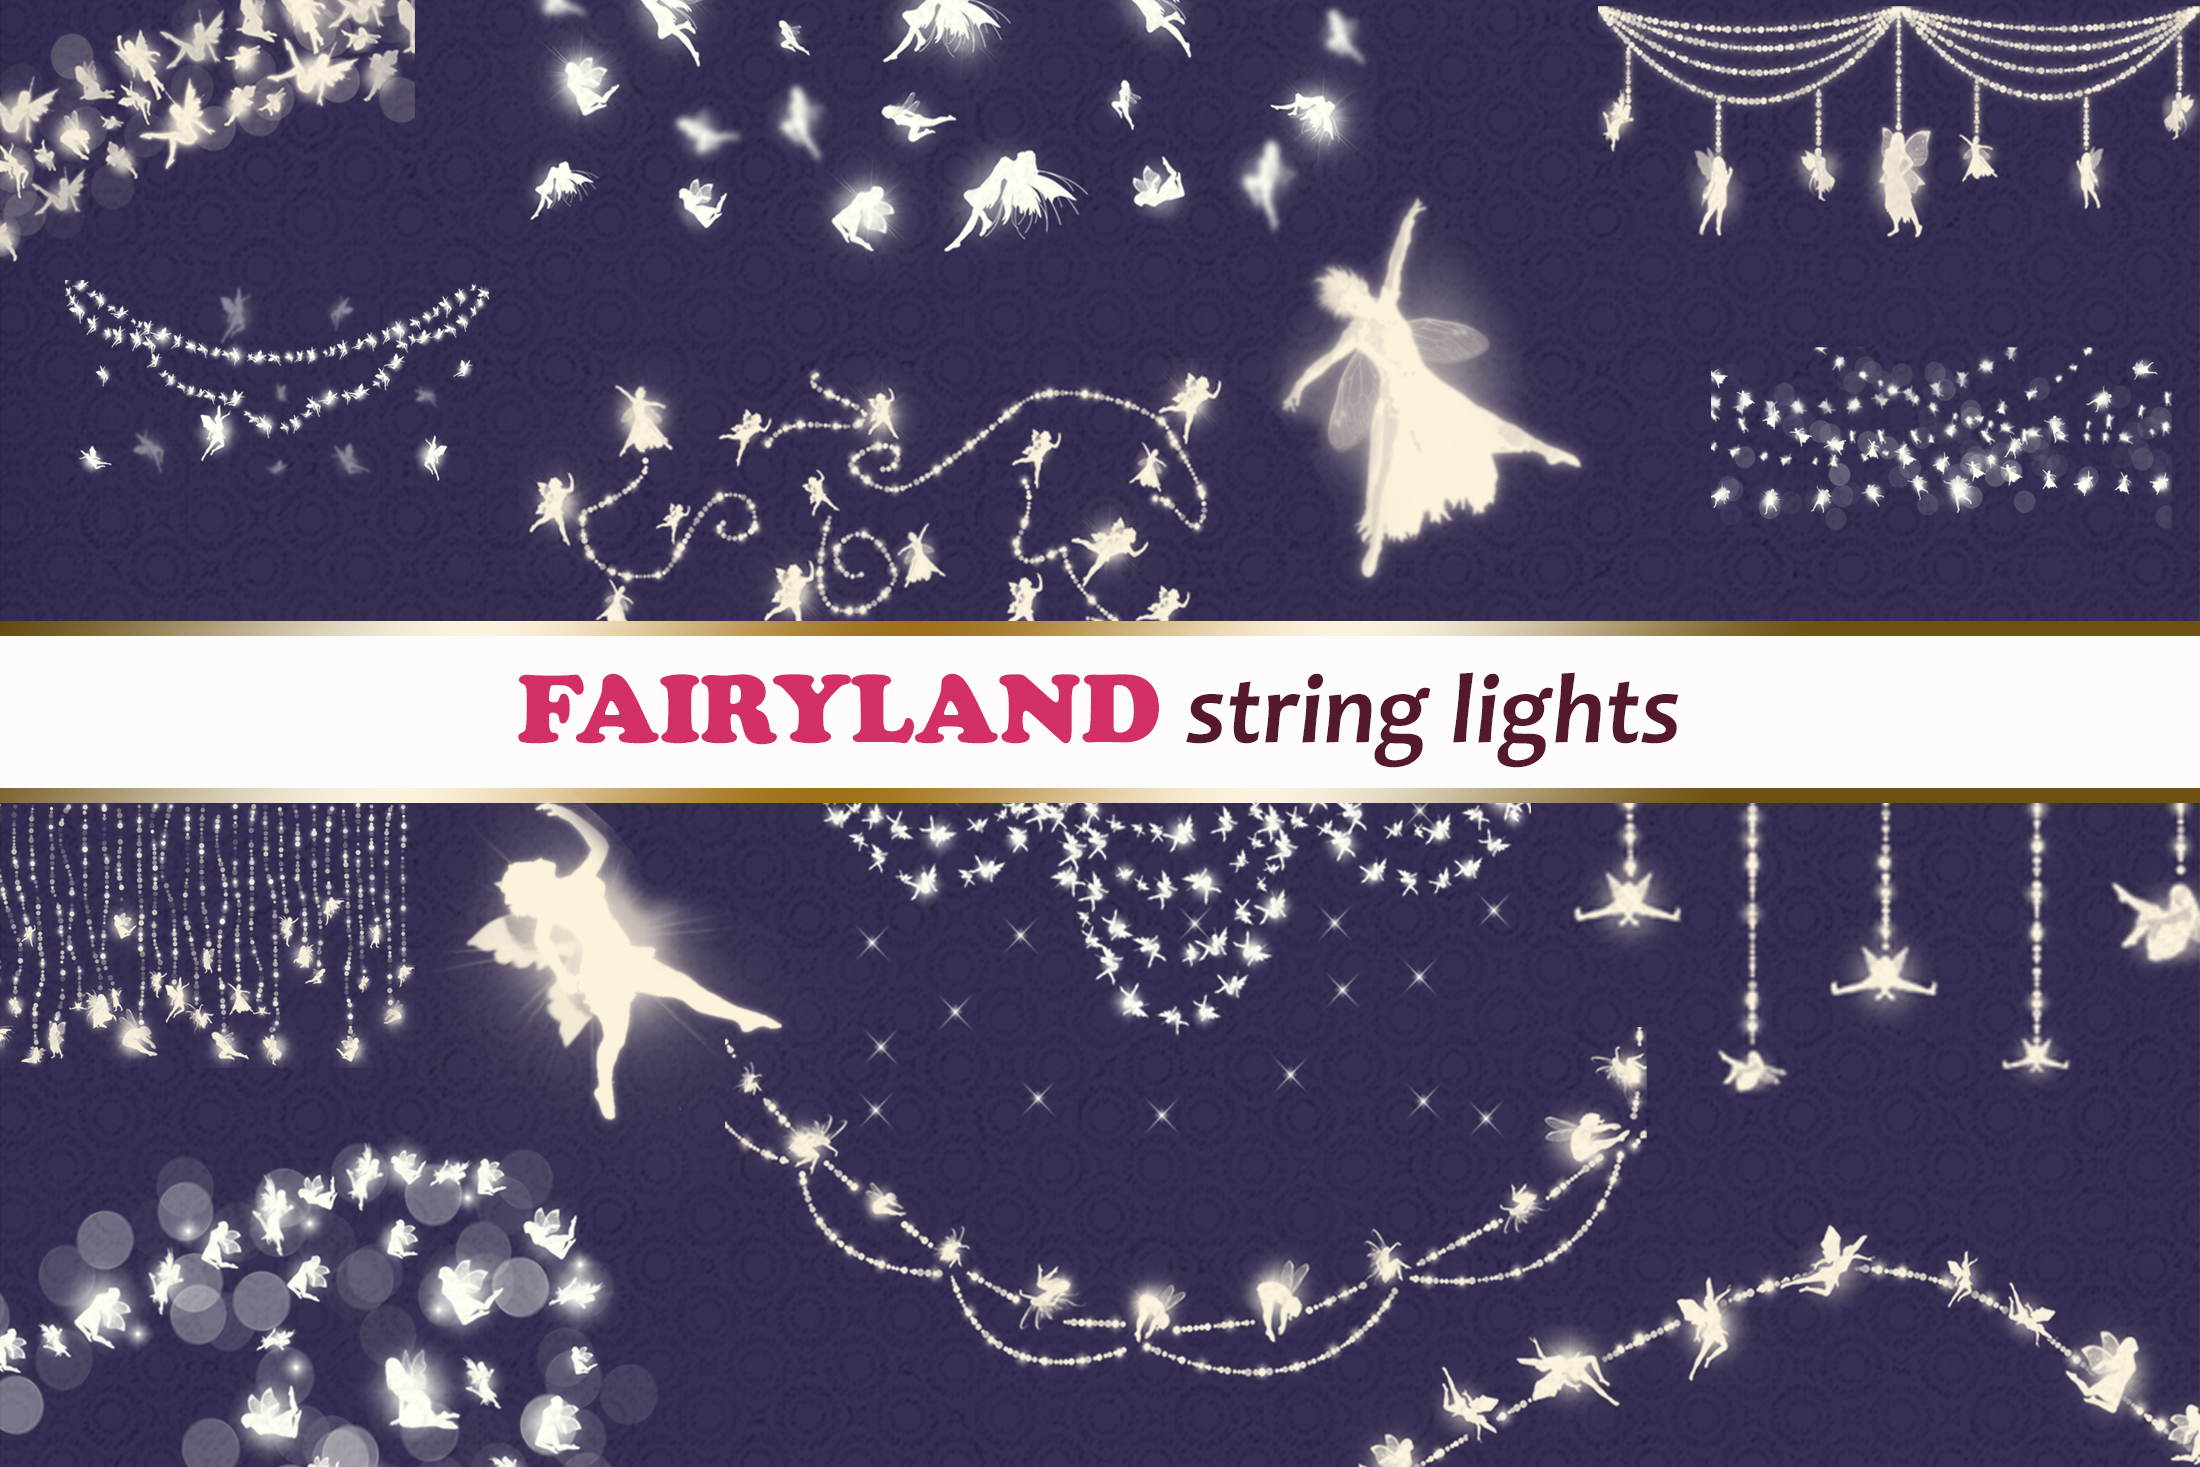 String lights FAIRYLAND example image 1